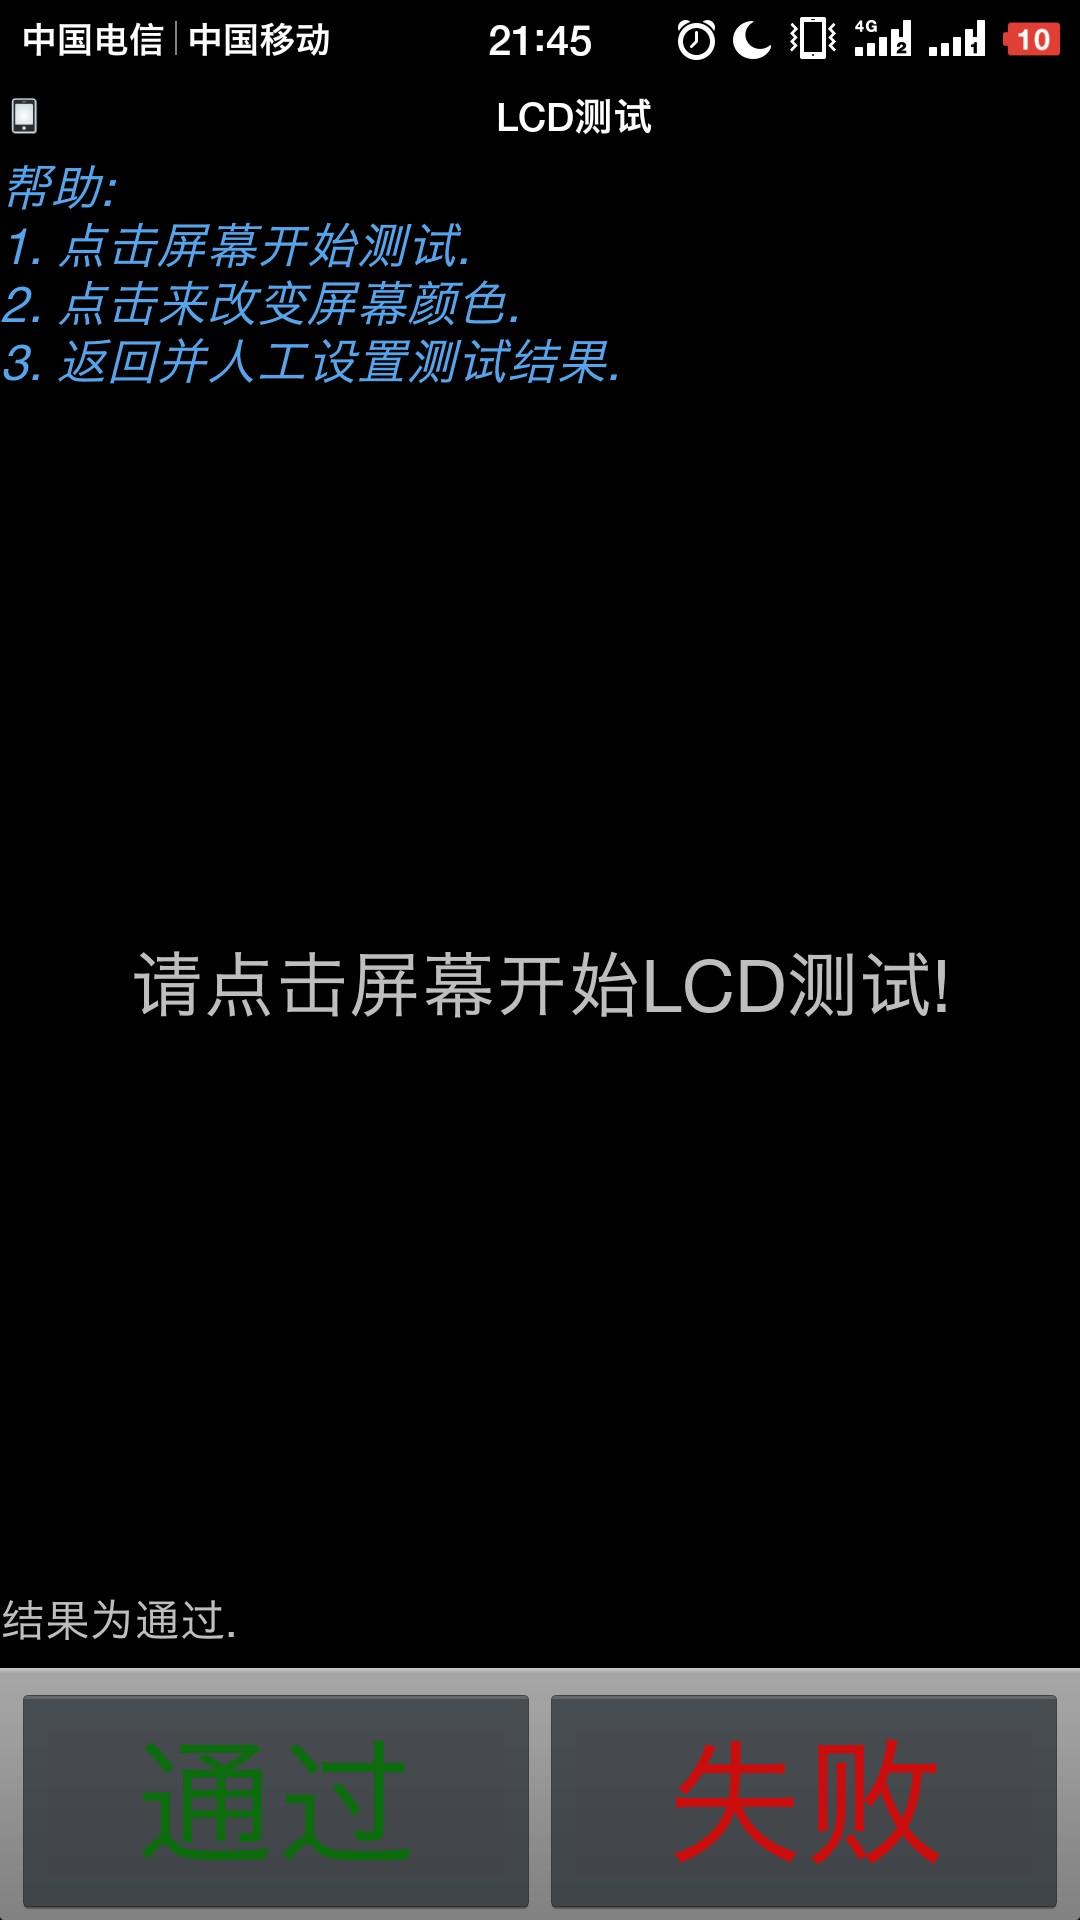 Screenshot_2018-01-14-21-45-54-486_?????? v2.1.png